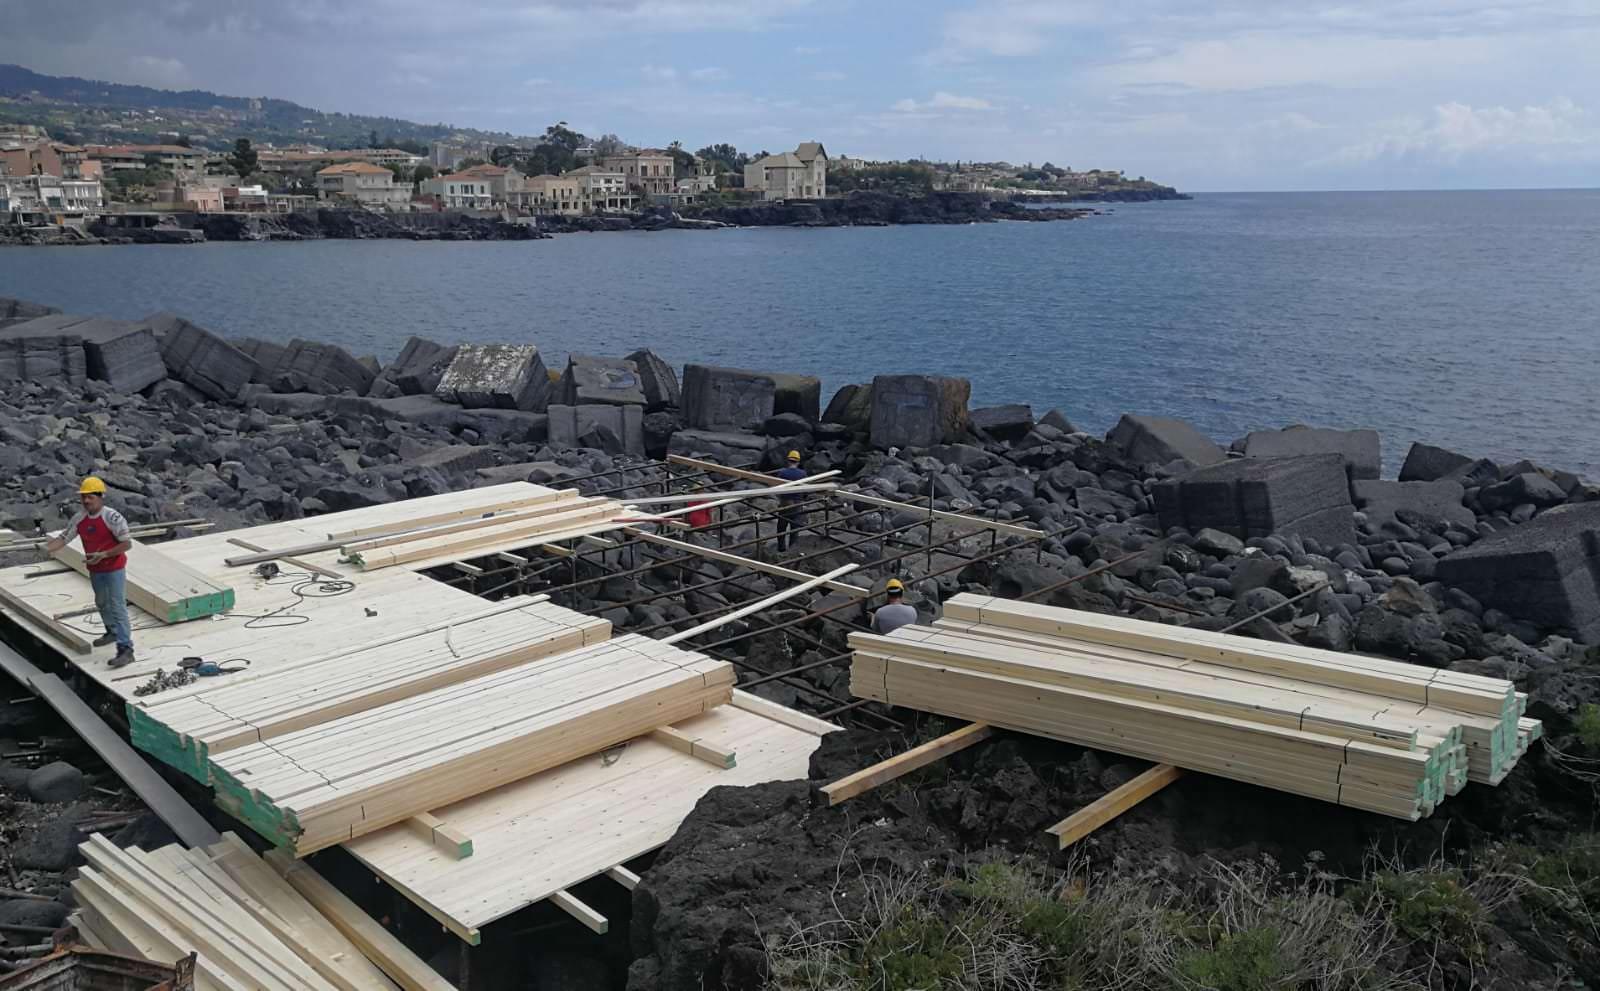 Solarium a Catania, ancora nessuna manifestazione di interesse per piazza Sciascia: avviati lavori in piazza Nettuno